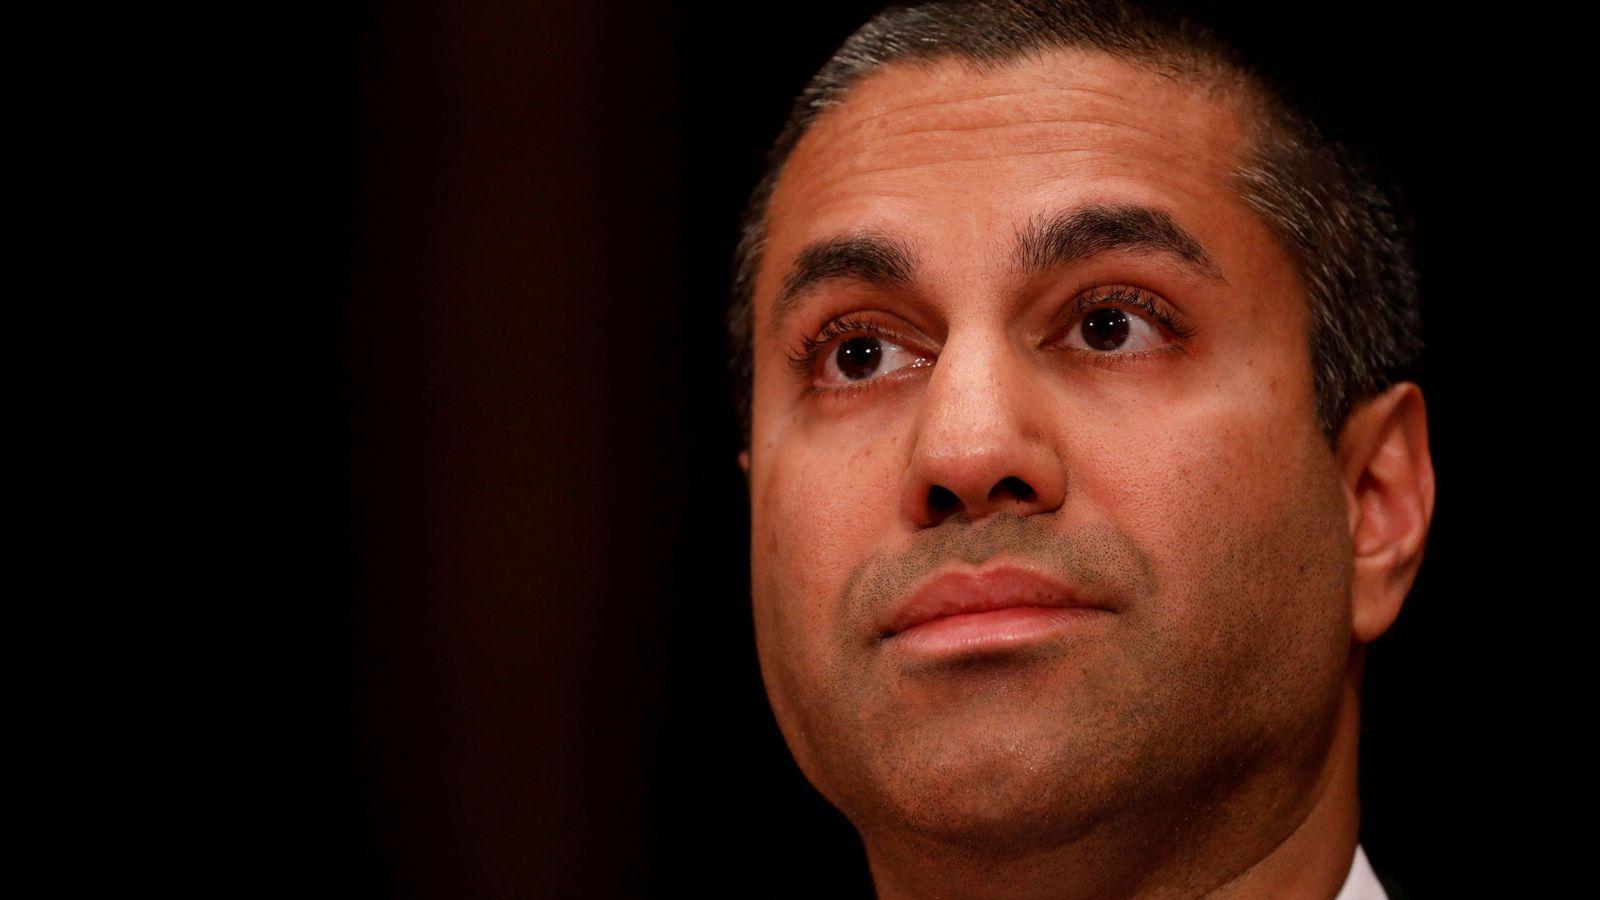 Foto: Ajit Pai, presidente de la FCC. (Reuters)